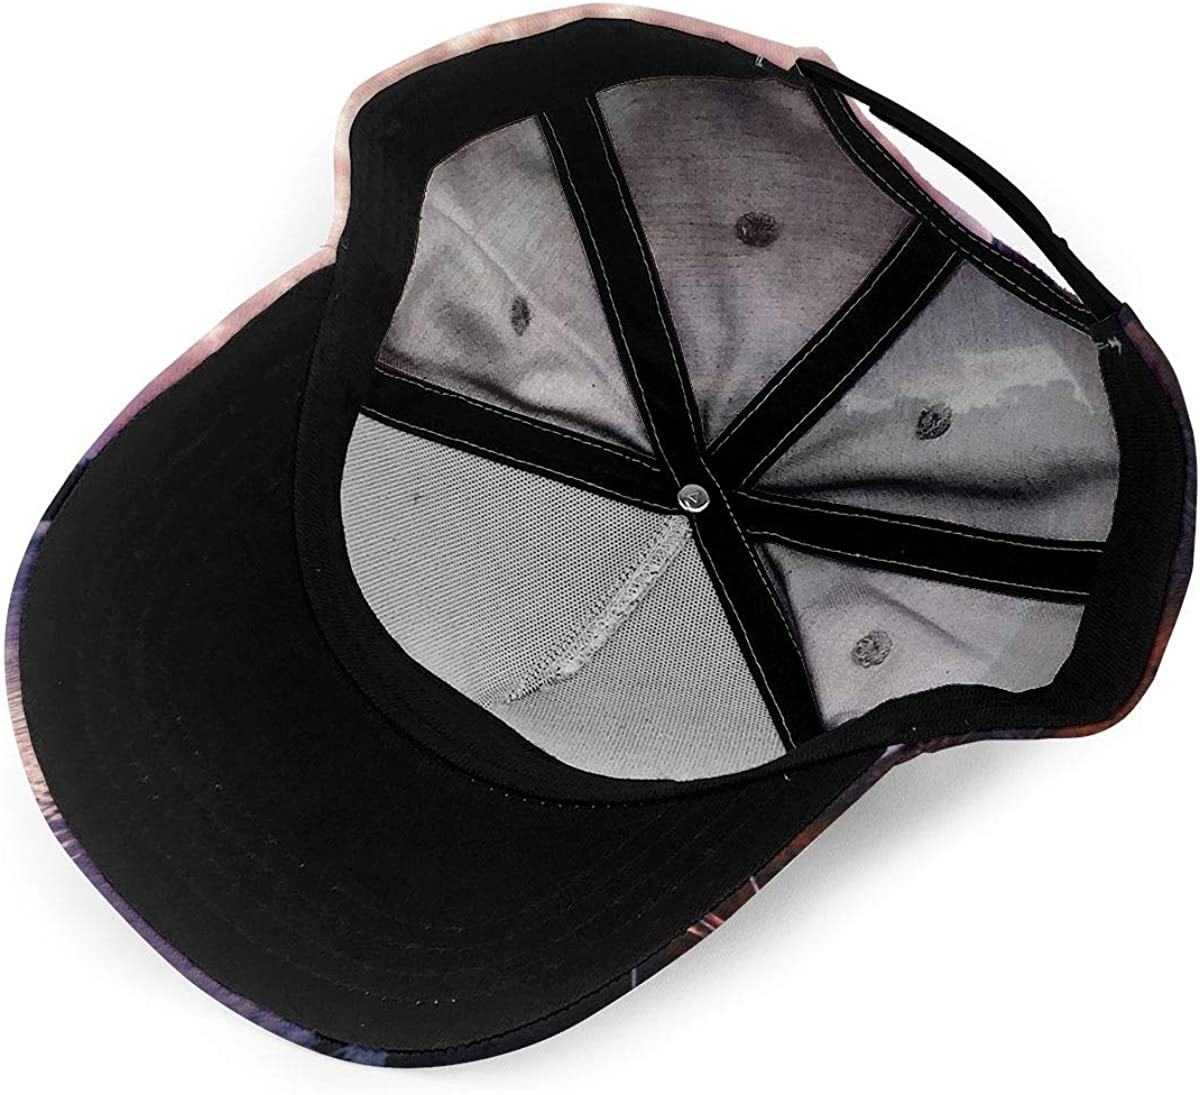 Nicokee Vikings Dakkar Dragon Boat Hat Baseball Cap Adjustable Snapback Hats Ball Hat for Men and Women